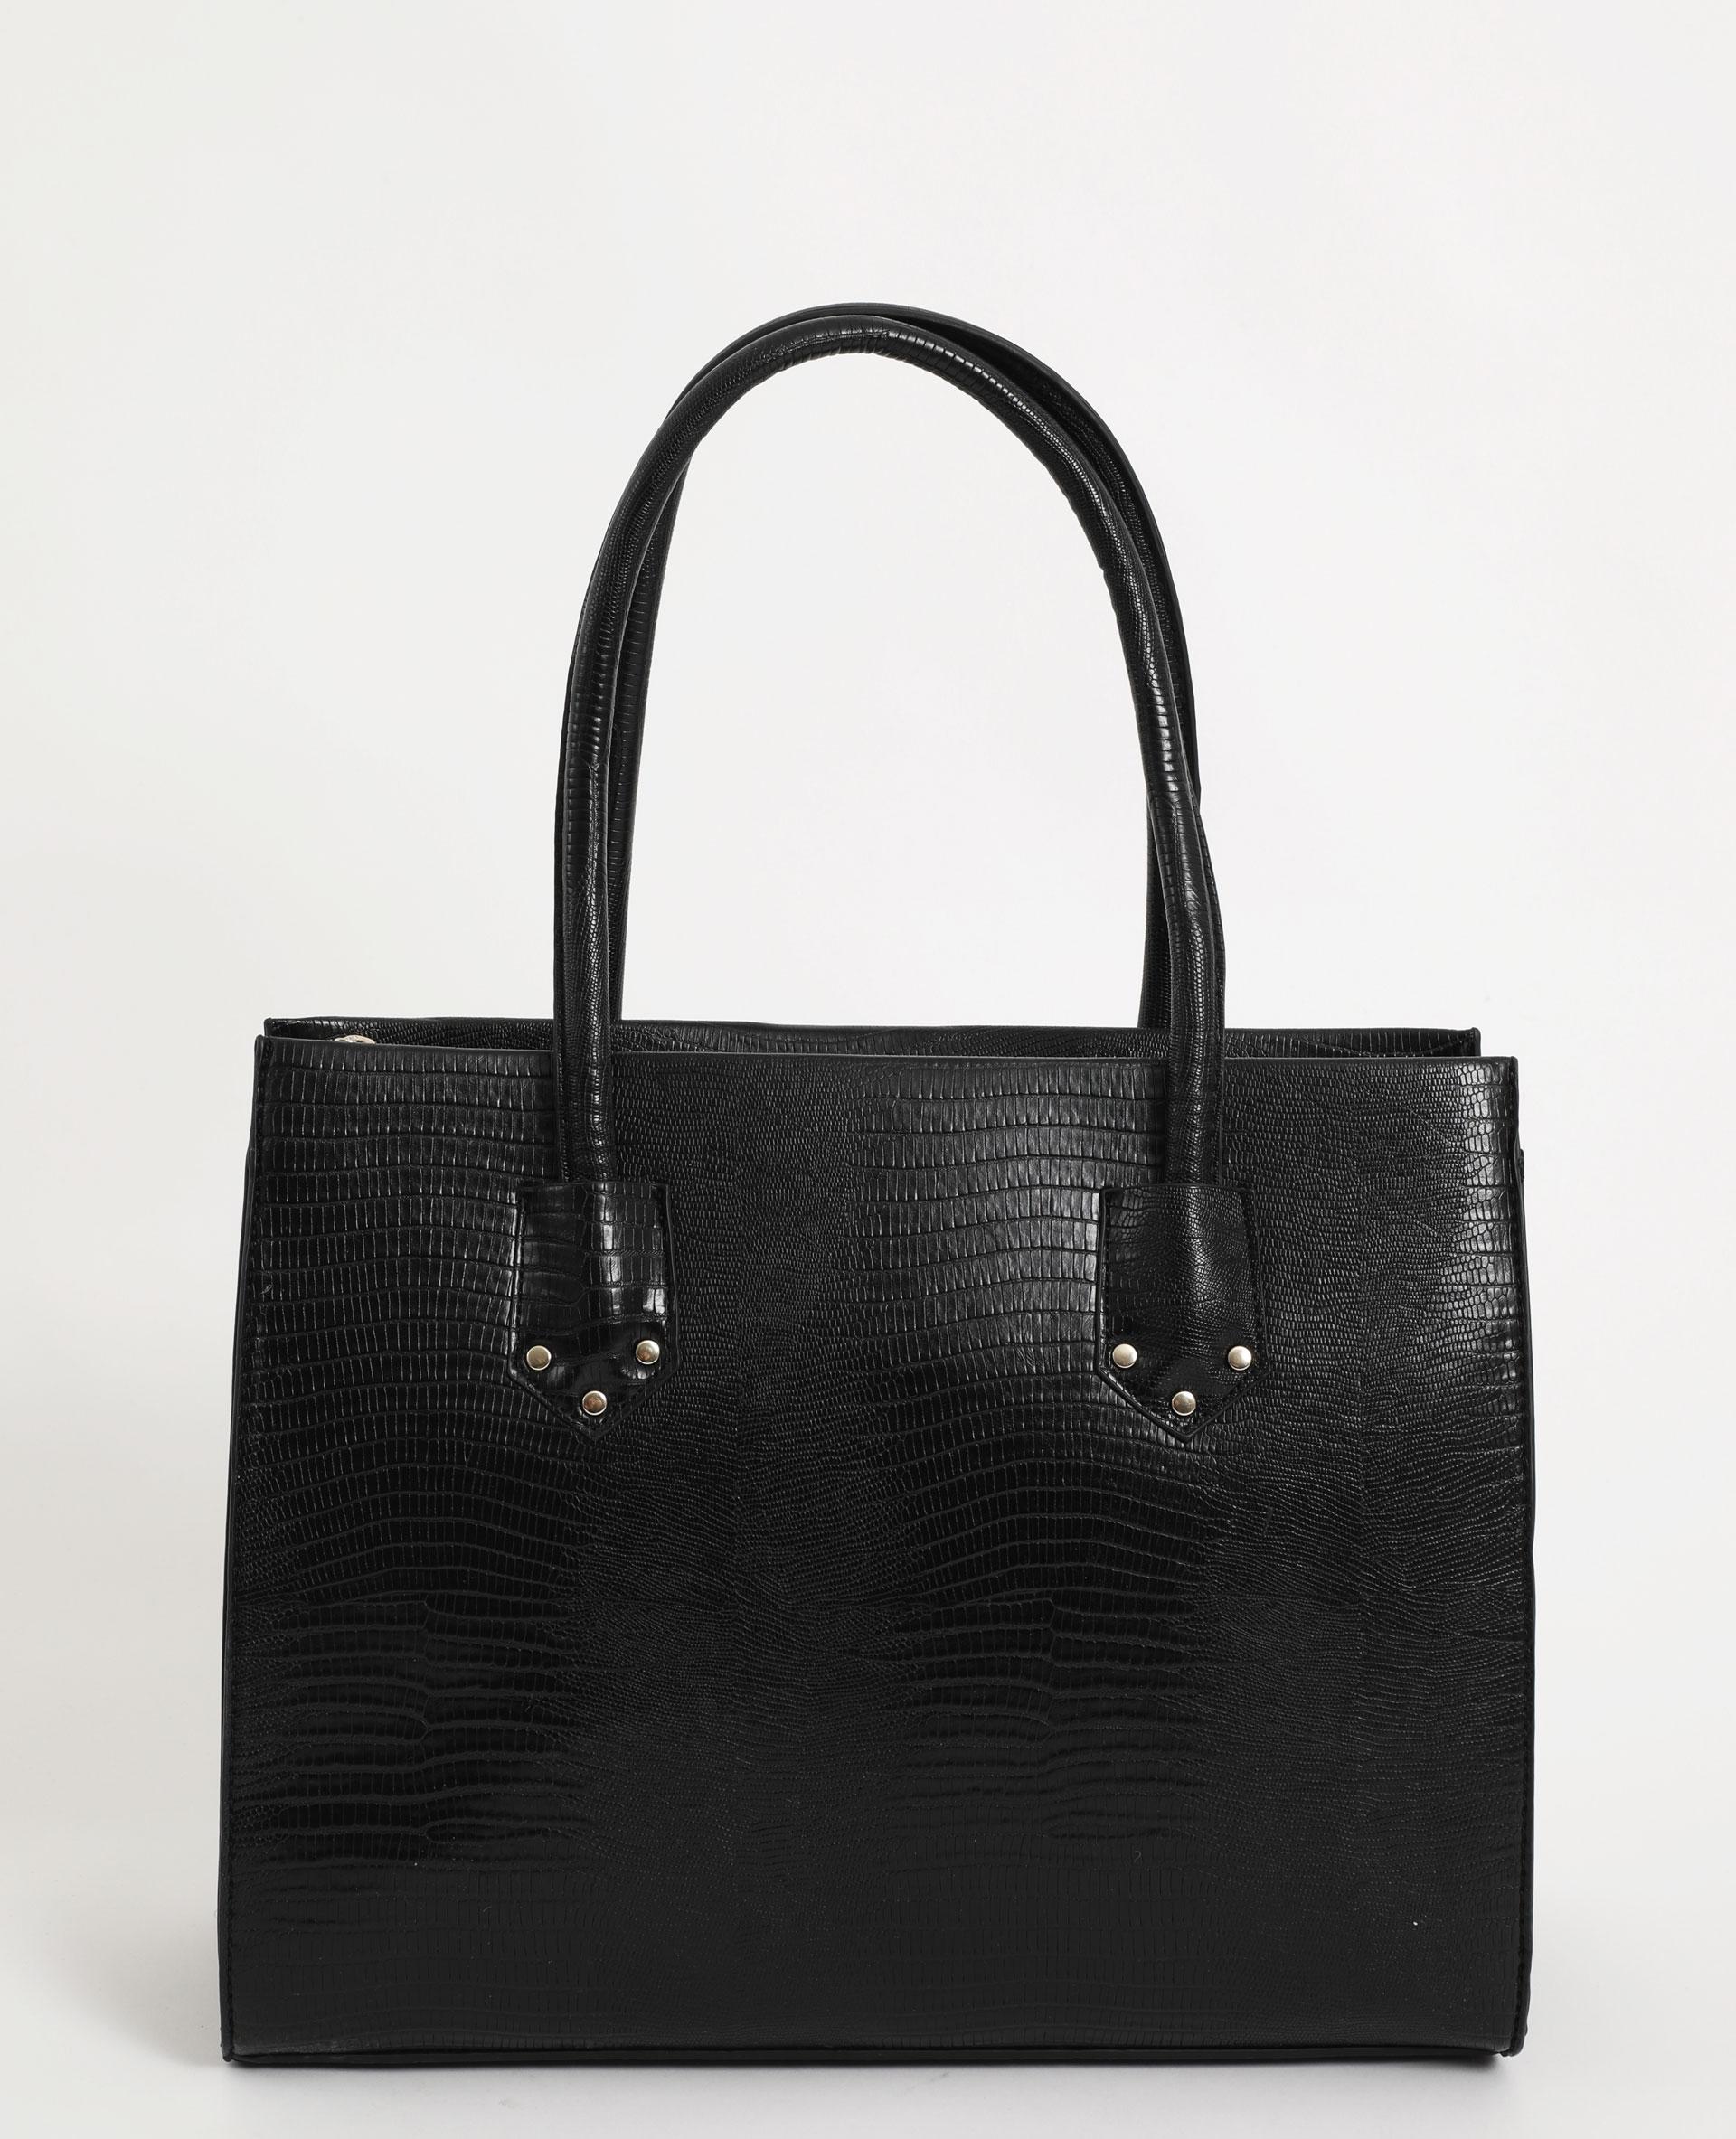 Grand sac rigide noir - Pimkie